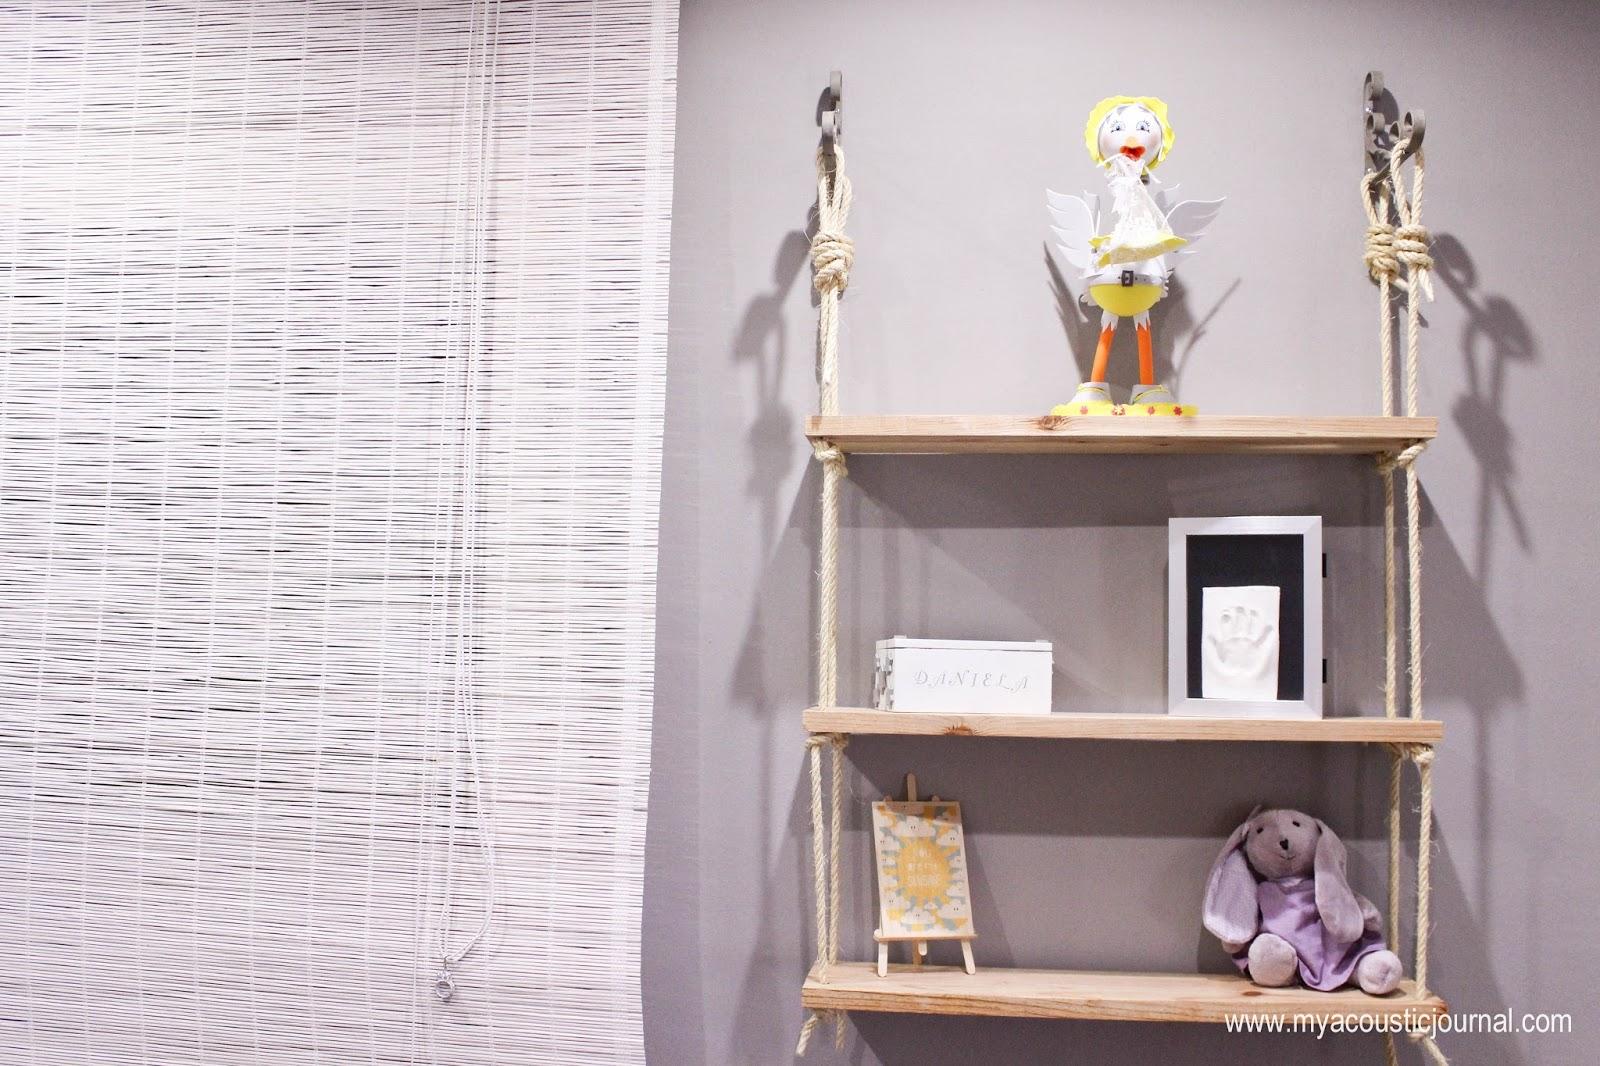 Estanterias Bebes Estanterias Para Dormitorios Infantiles Estantes Libros Dormitorio Pared Dormitorios Category With Post Estanterias Para